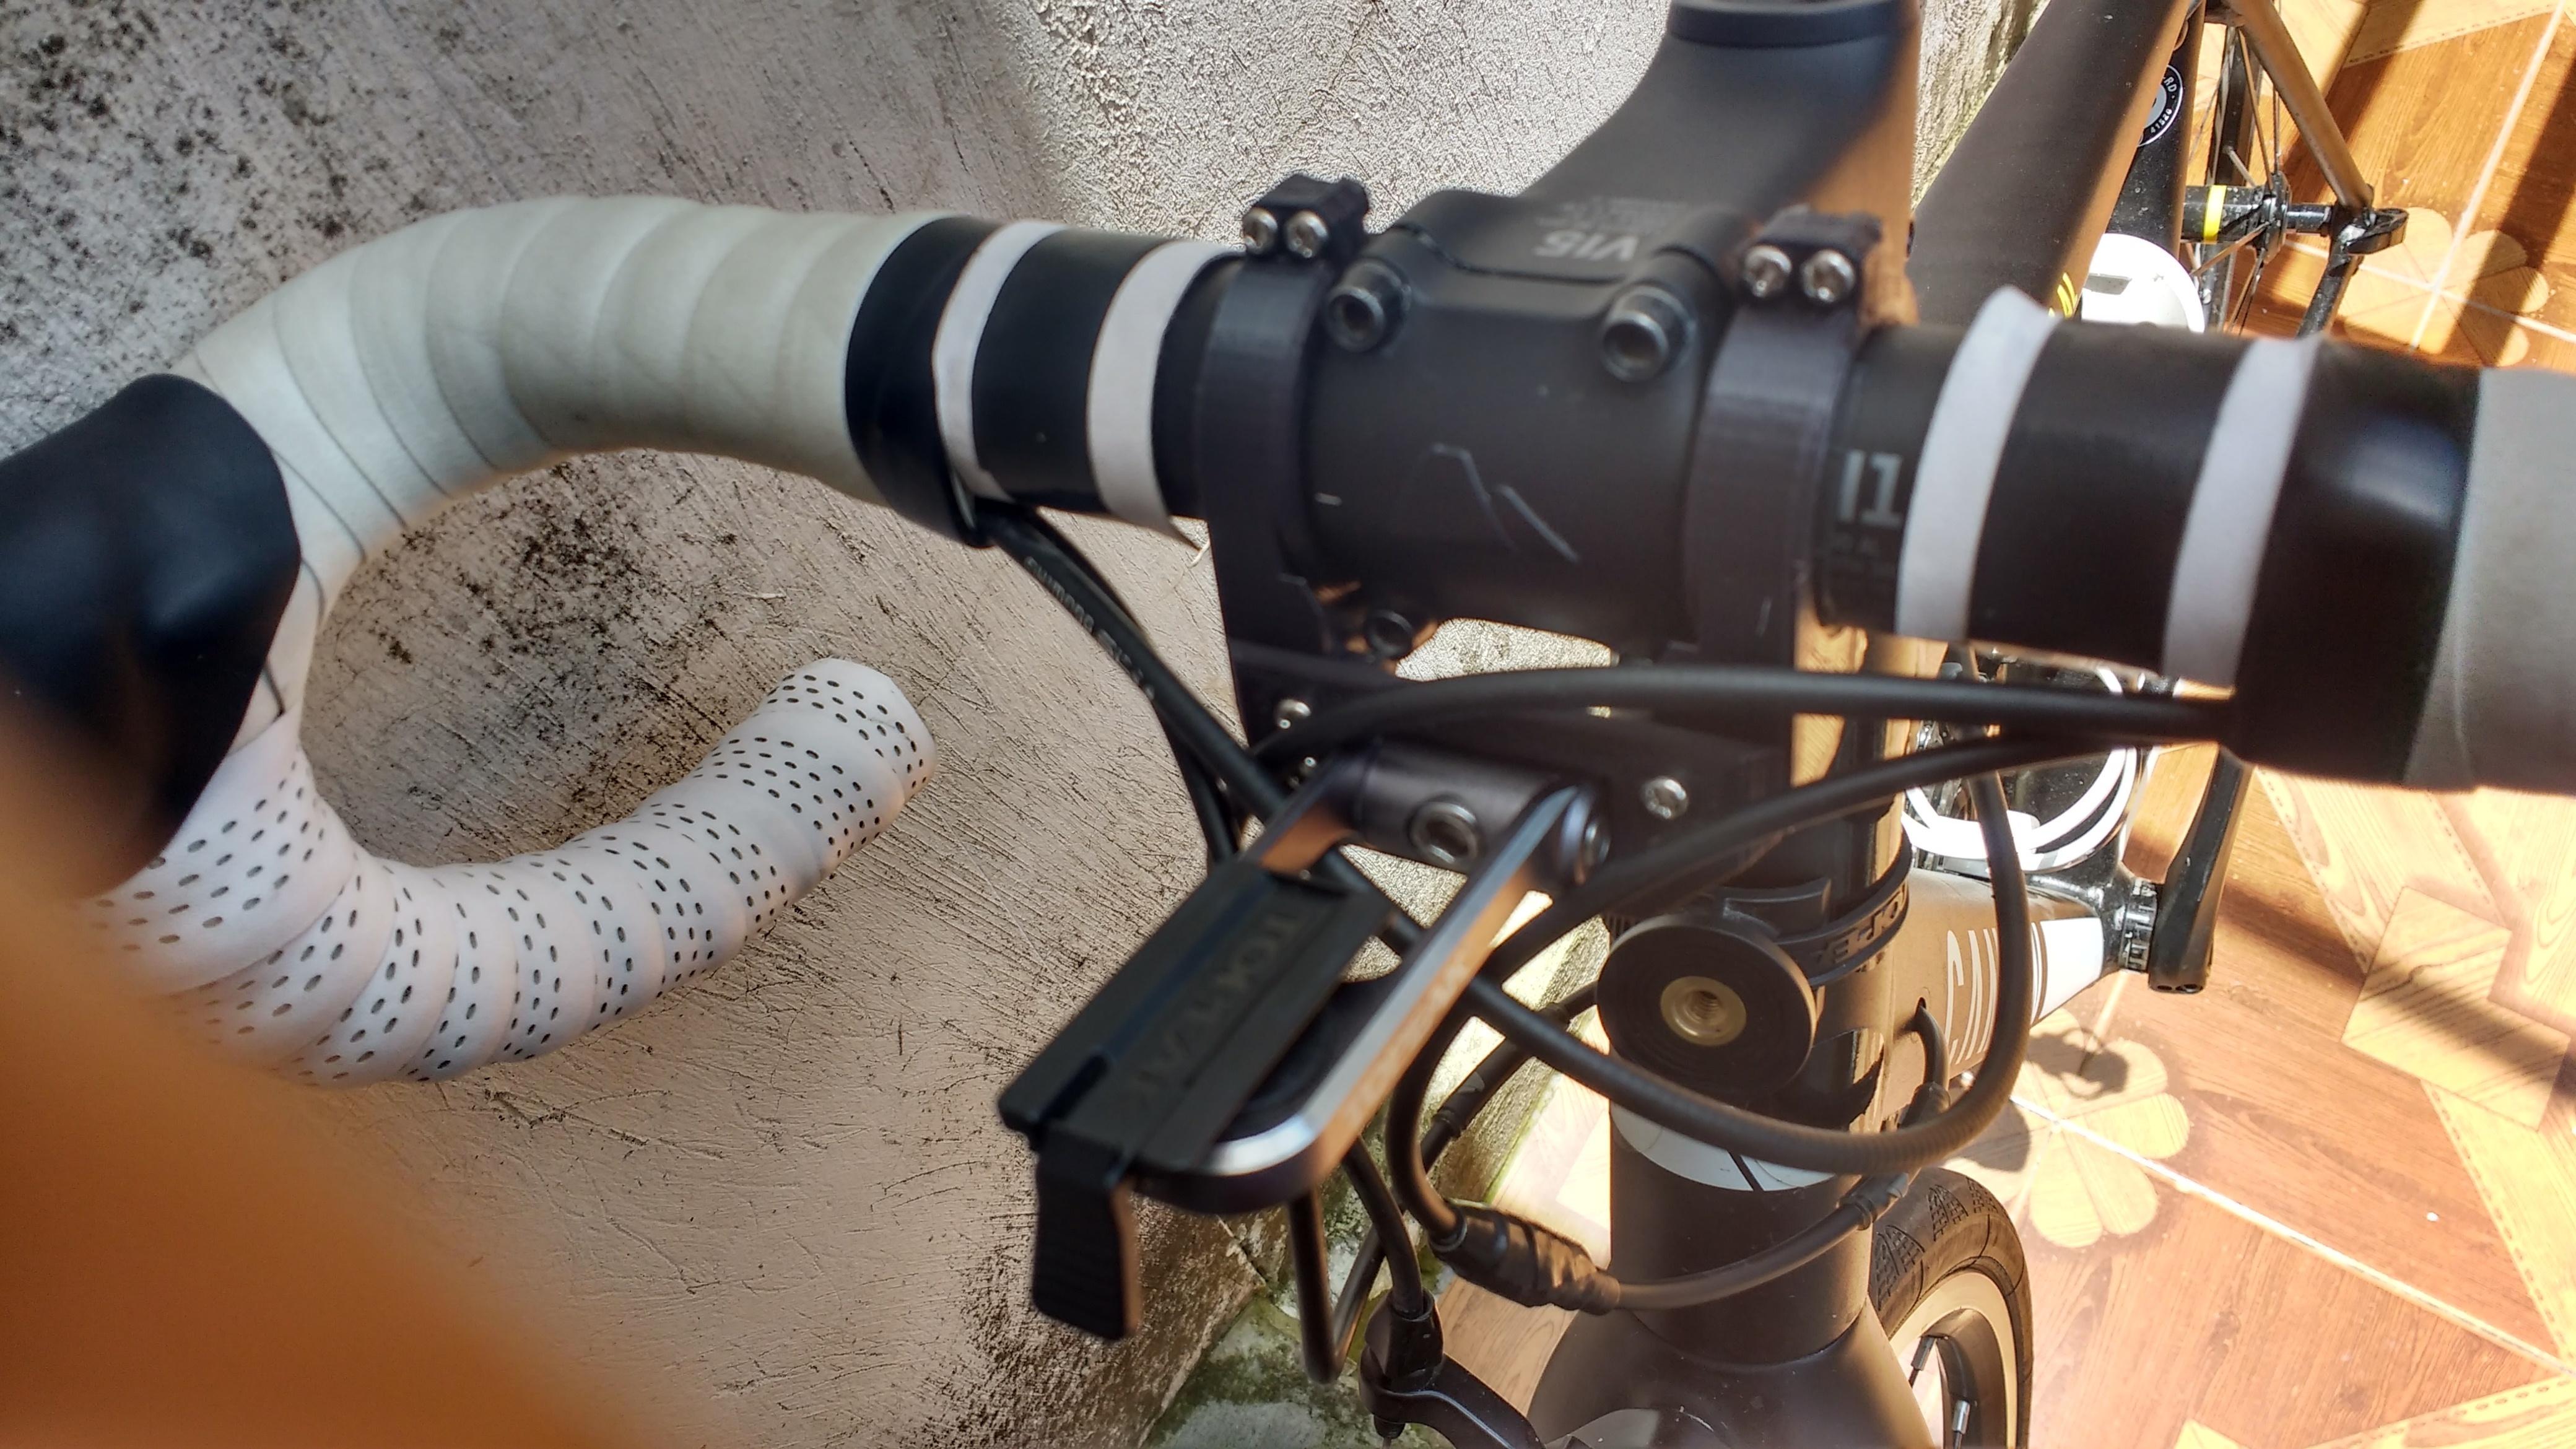 IMG_20170713_132622534_HDR.jpg Télécharger fichier STL gratuit mod of topeak cycle computer mount for canyon road bike • Plan à imprimer en 3D, FenixYeshua